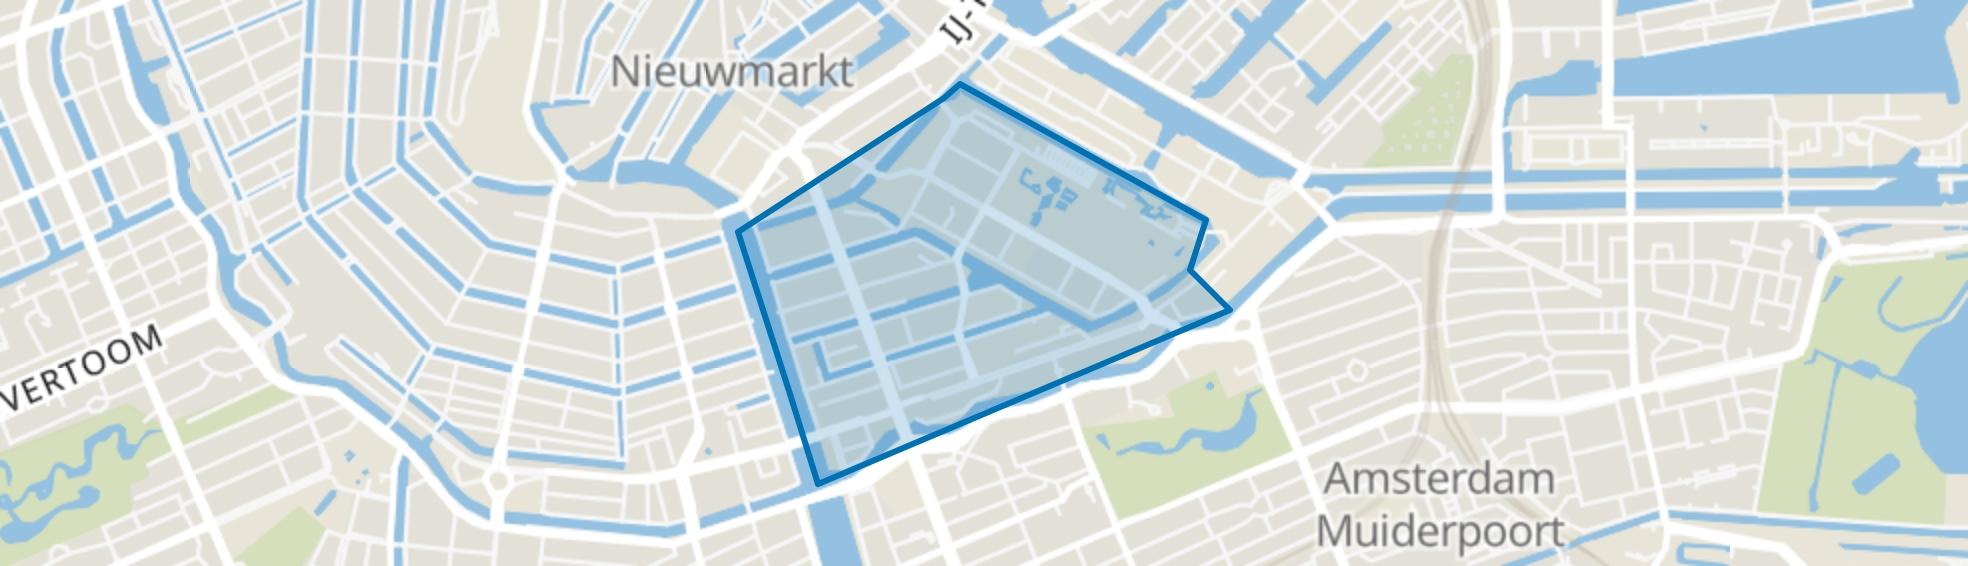 Weesperbuurt/Plantage, Amsterdam map